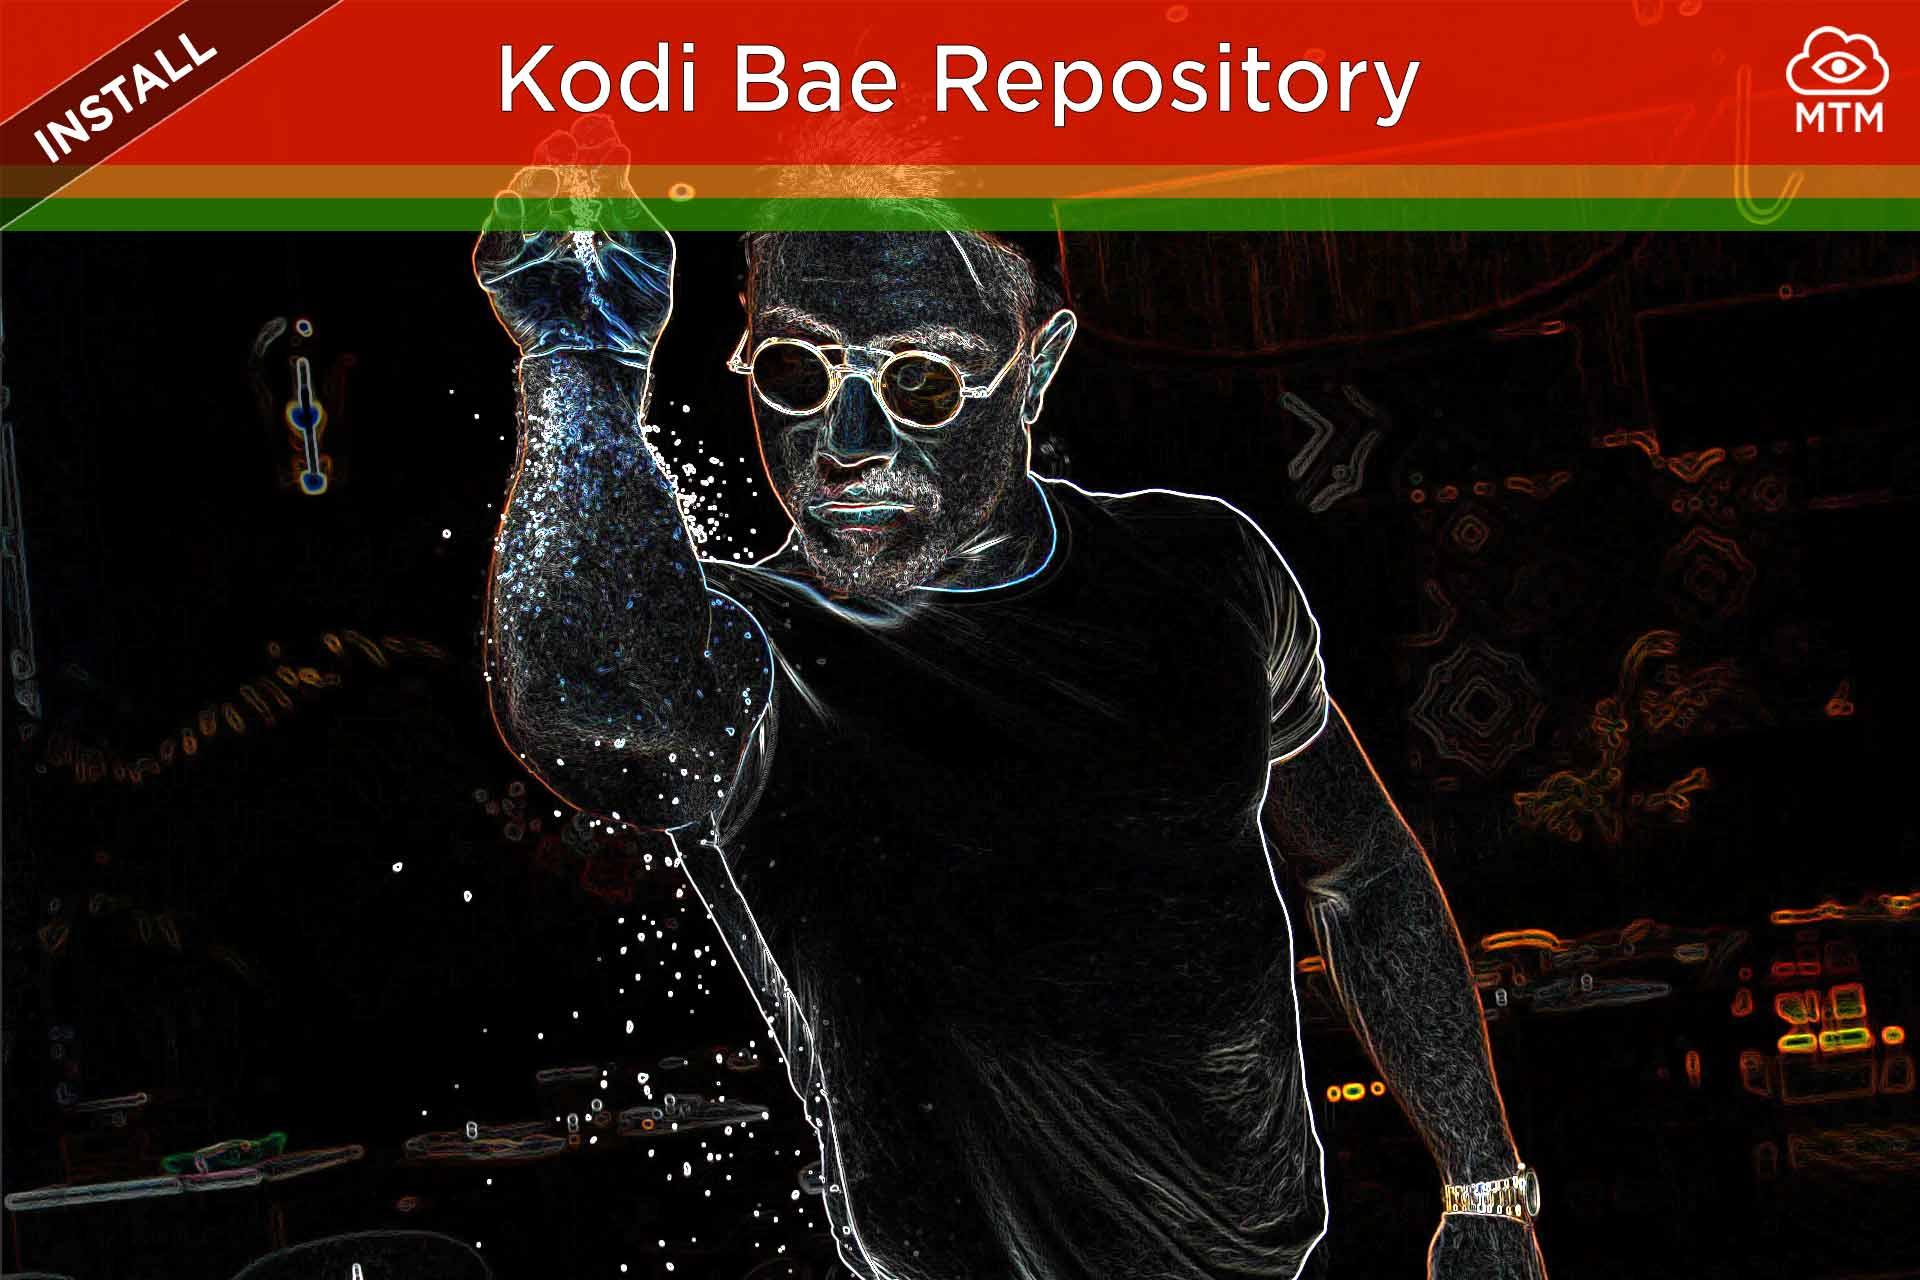 Instalatu Kodi Bae Repo Firestick & Android Box-en